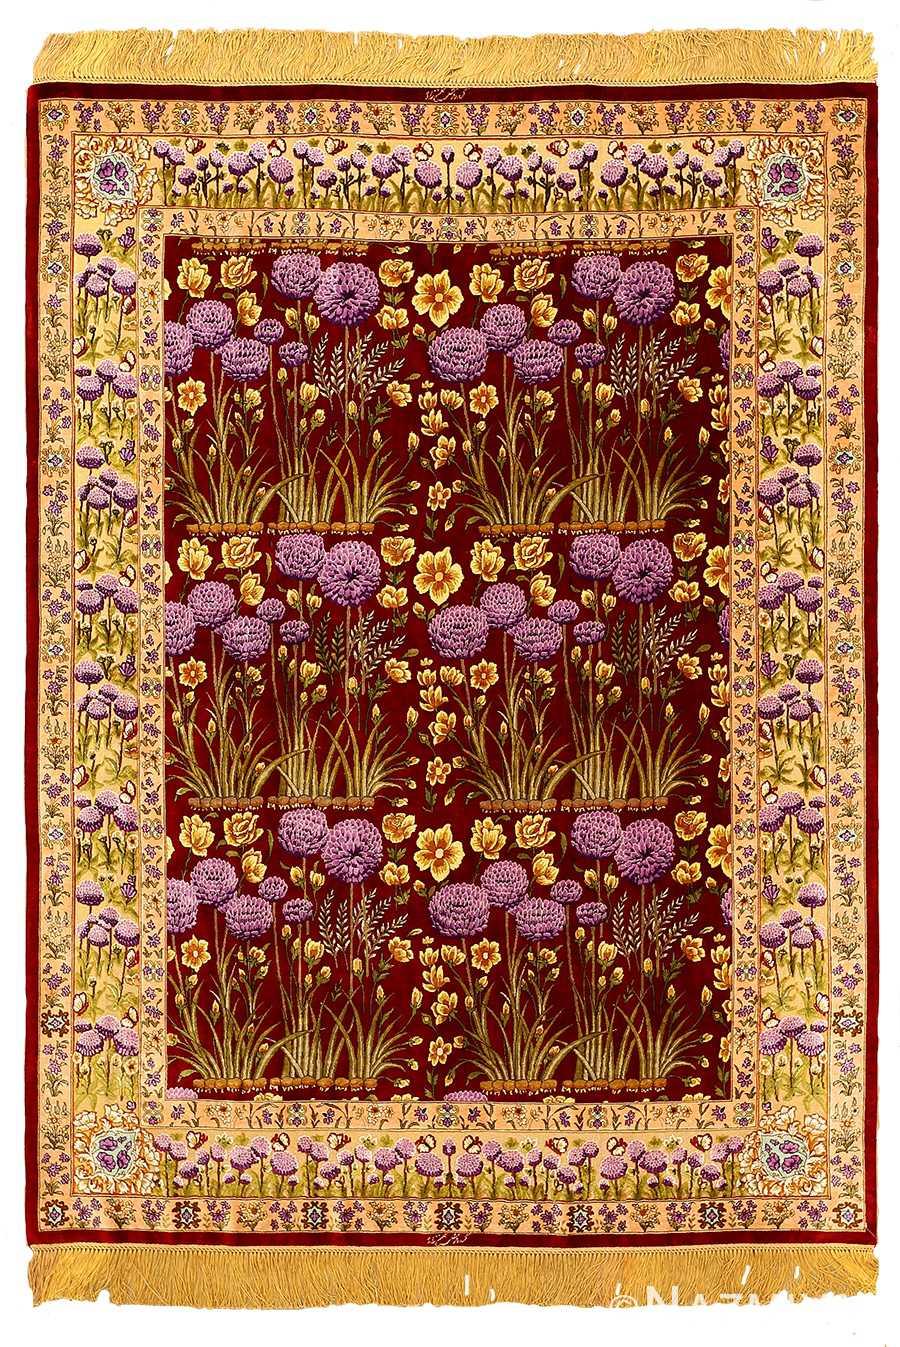 Small Floral Vintage Persian Luxury Silk Tabriz Rug 51178 by Nazmiyal